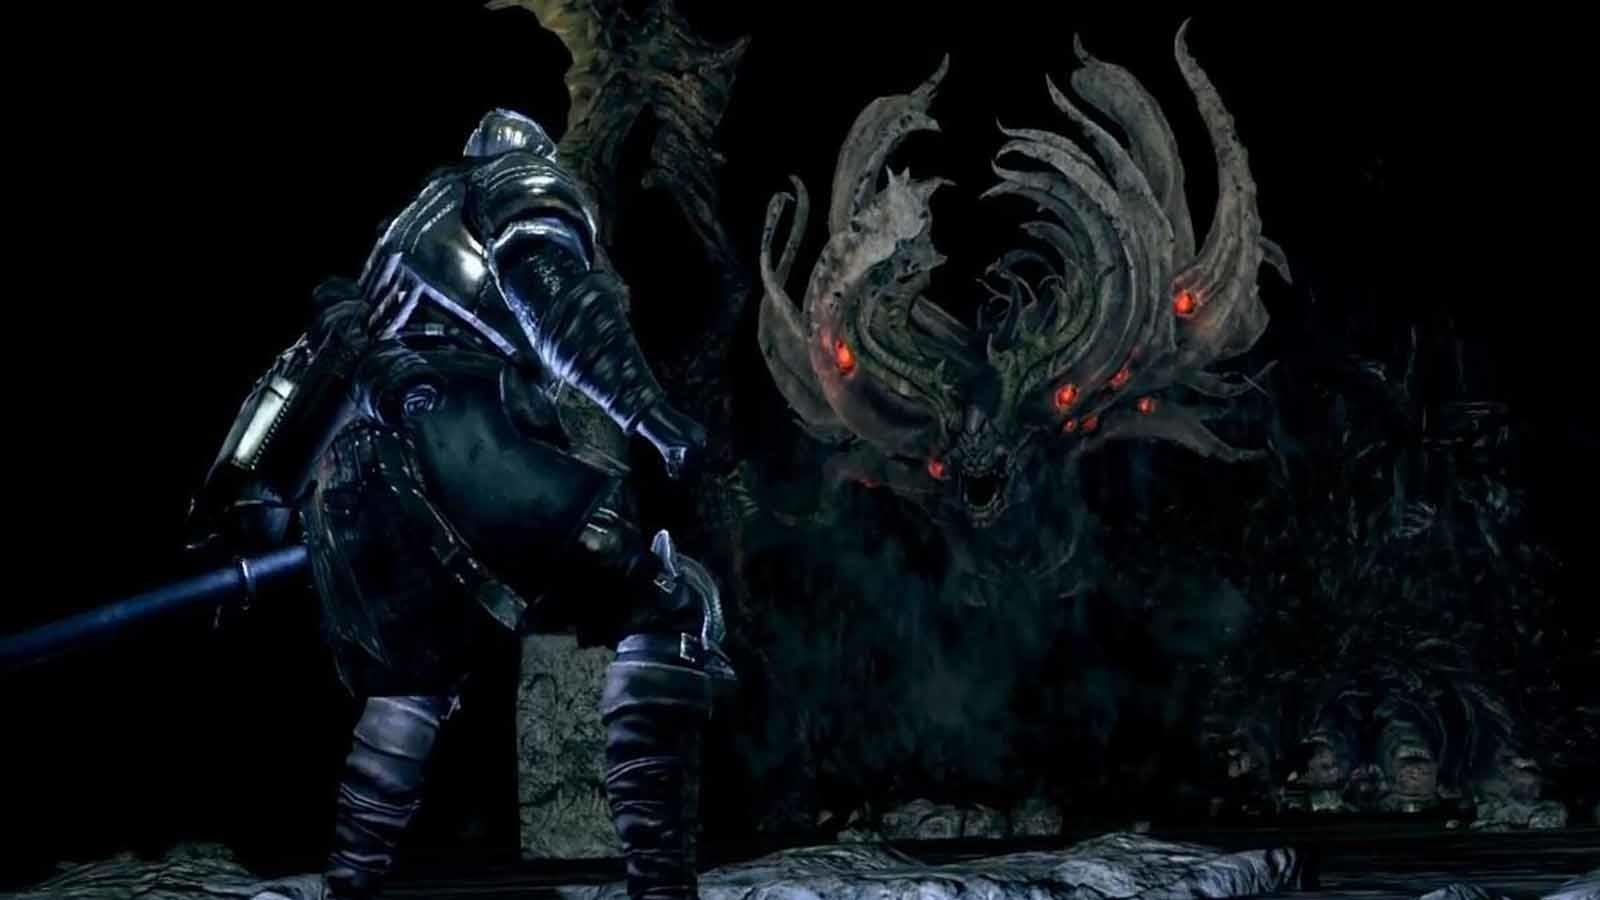 NS《黑暗之魂 復刻版》公佈五分鐘介紹影像,10月18日發售